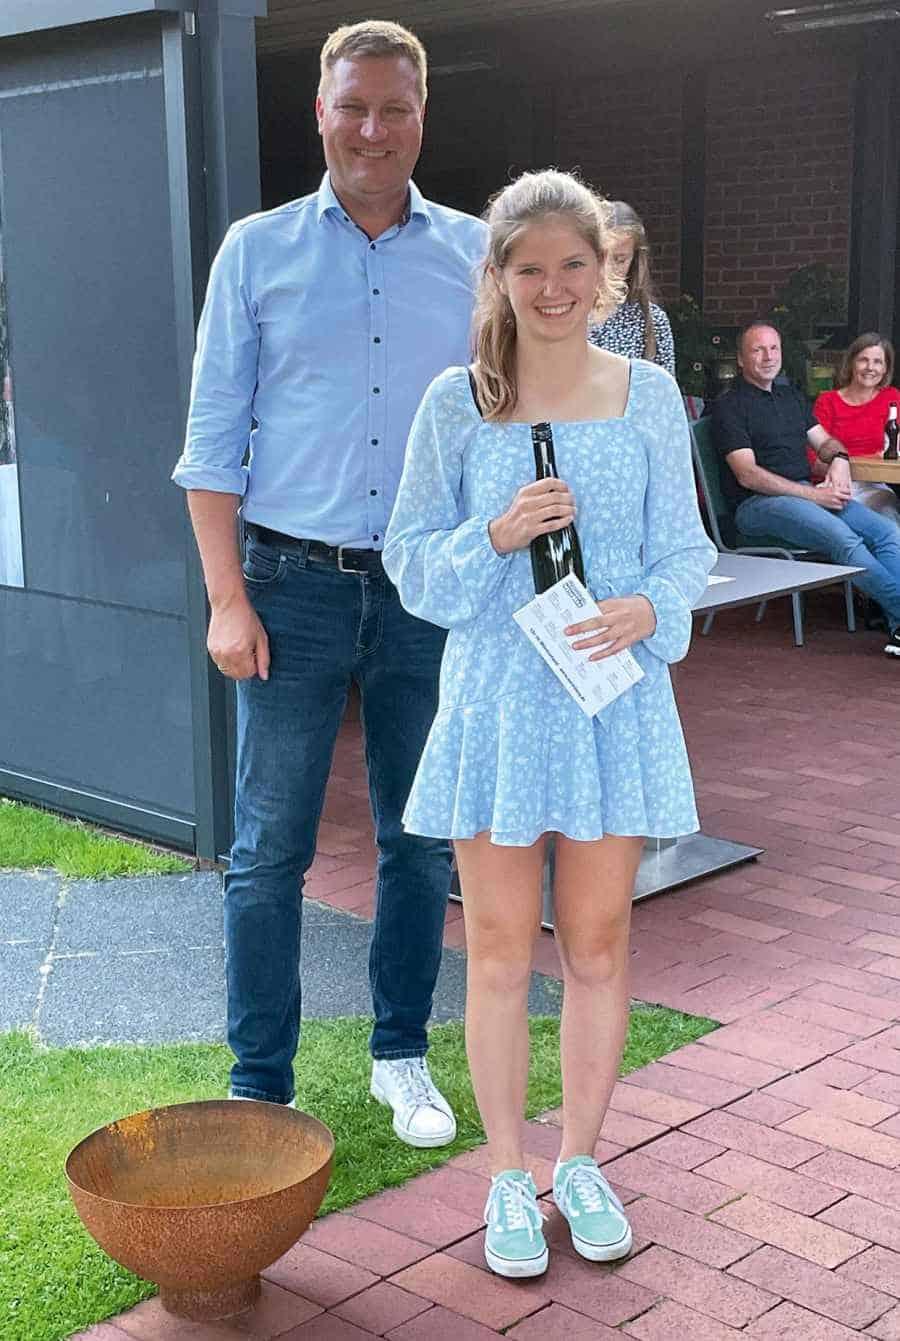 GLC Coesfeld Austragungsort Meimberg CUP